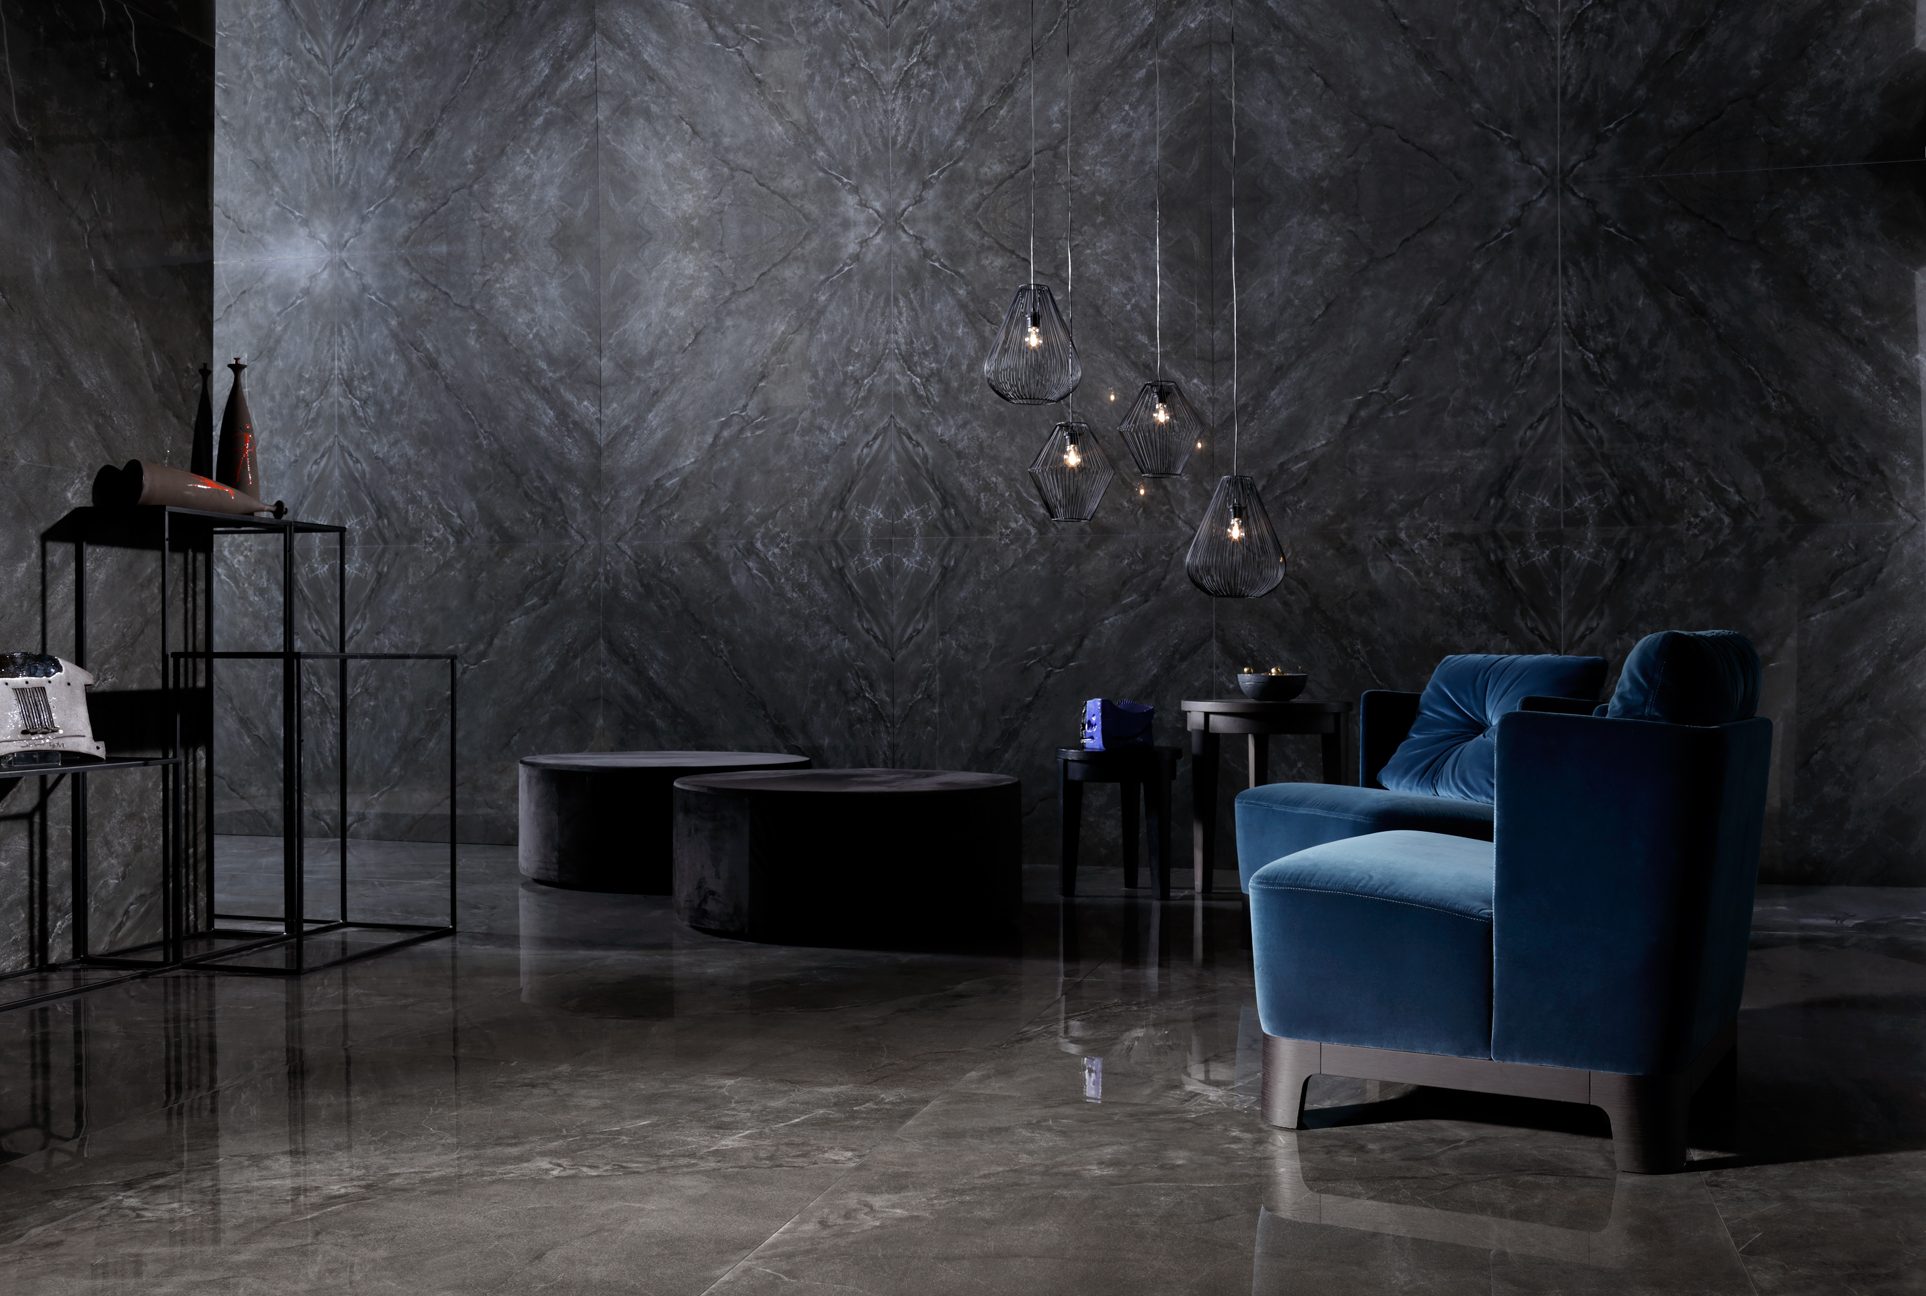 porcelain tile images: Grandiosa range high quality photo